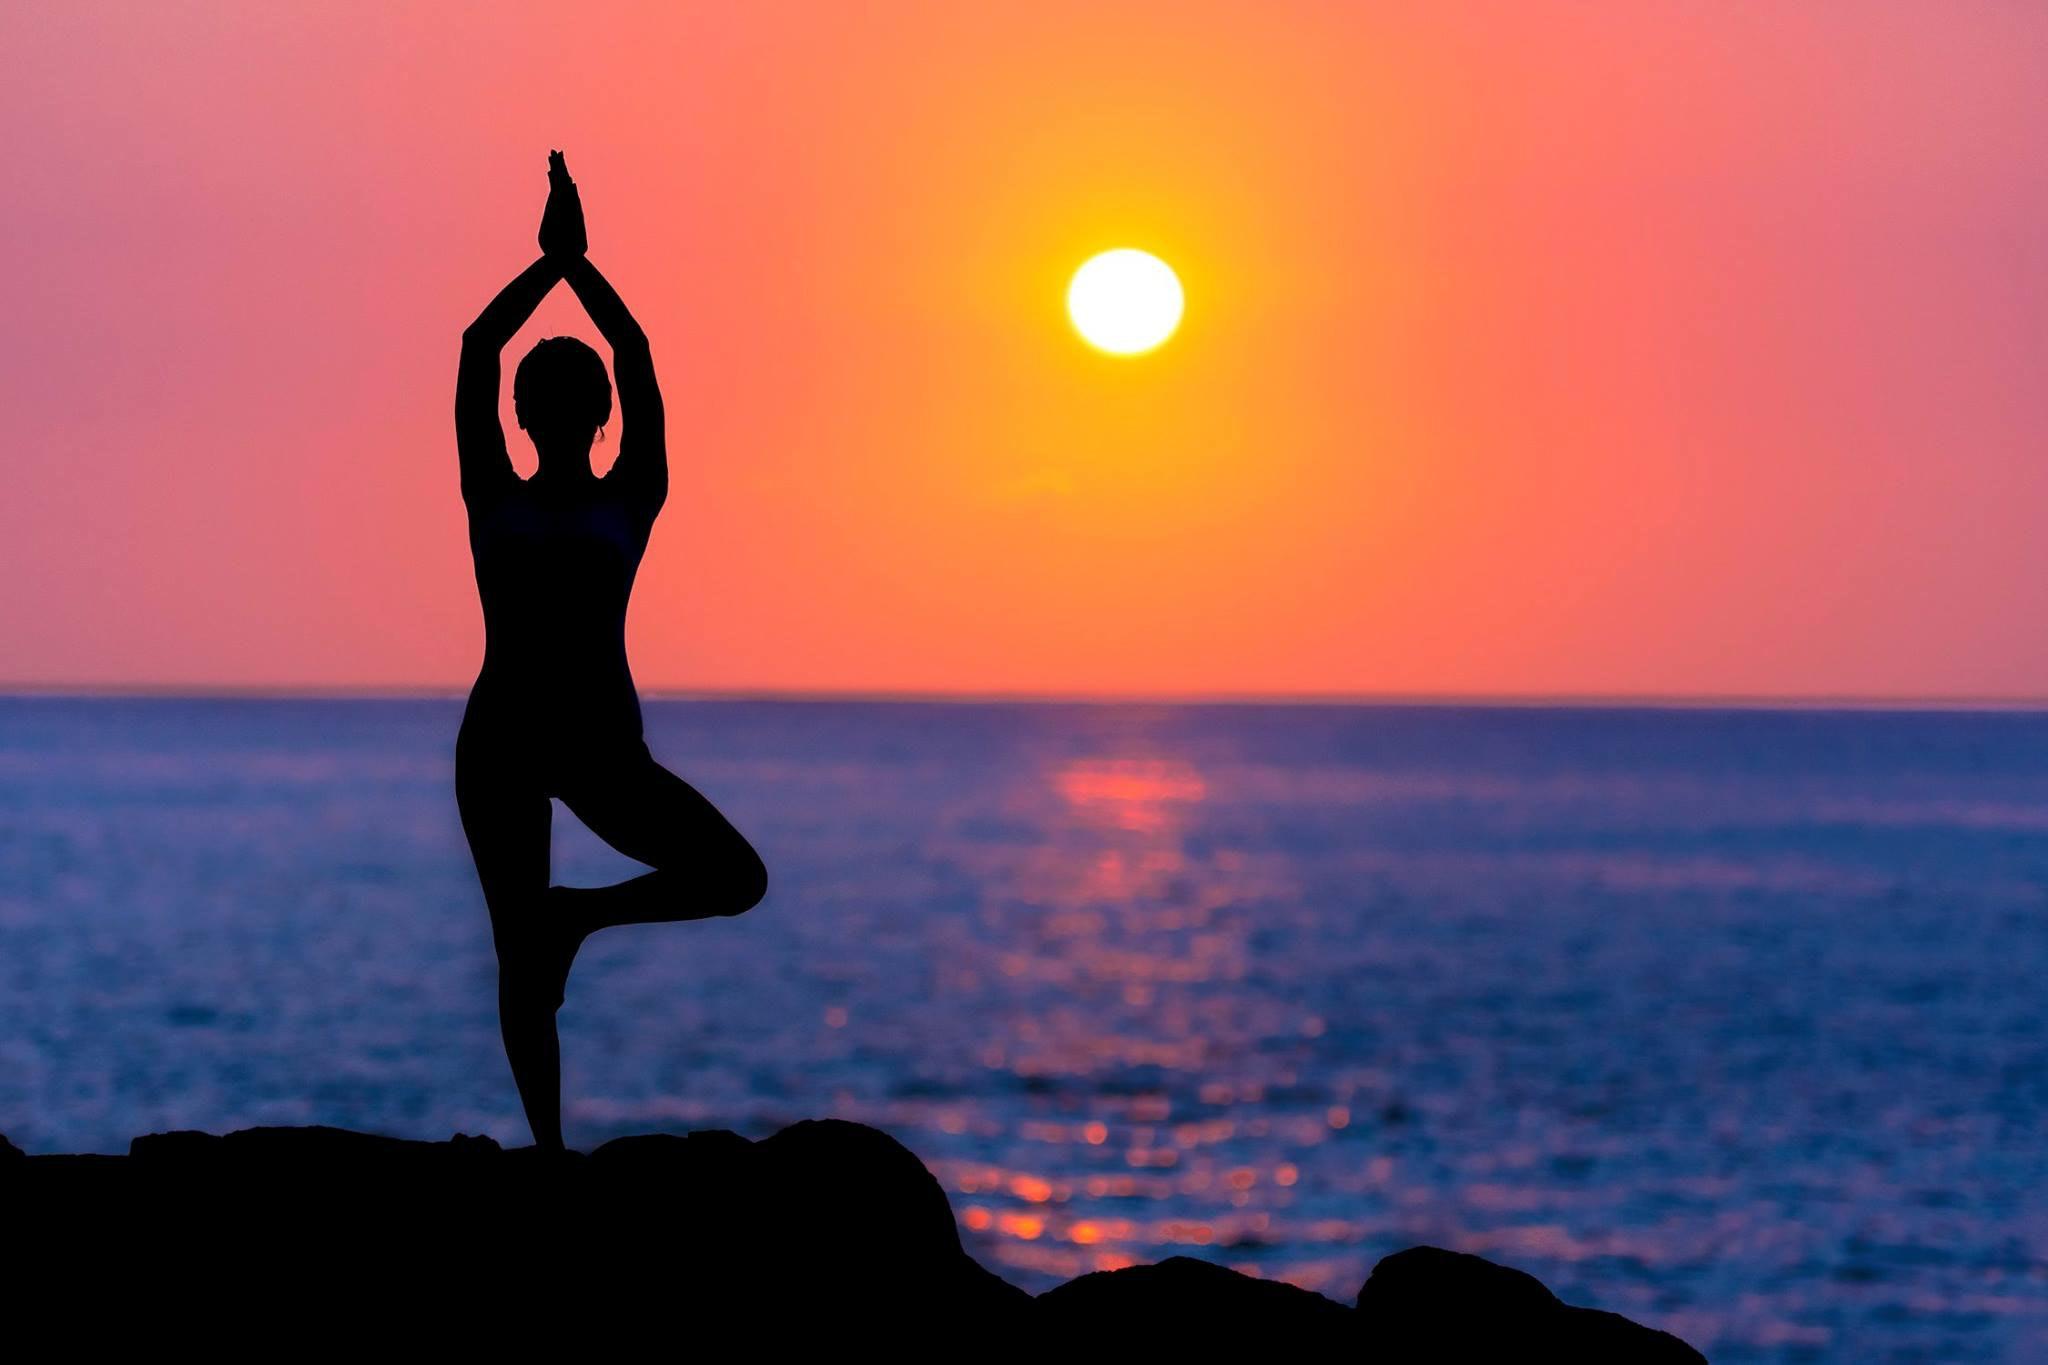 Yoga pic images 89